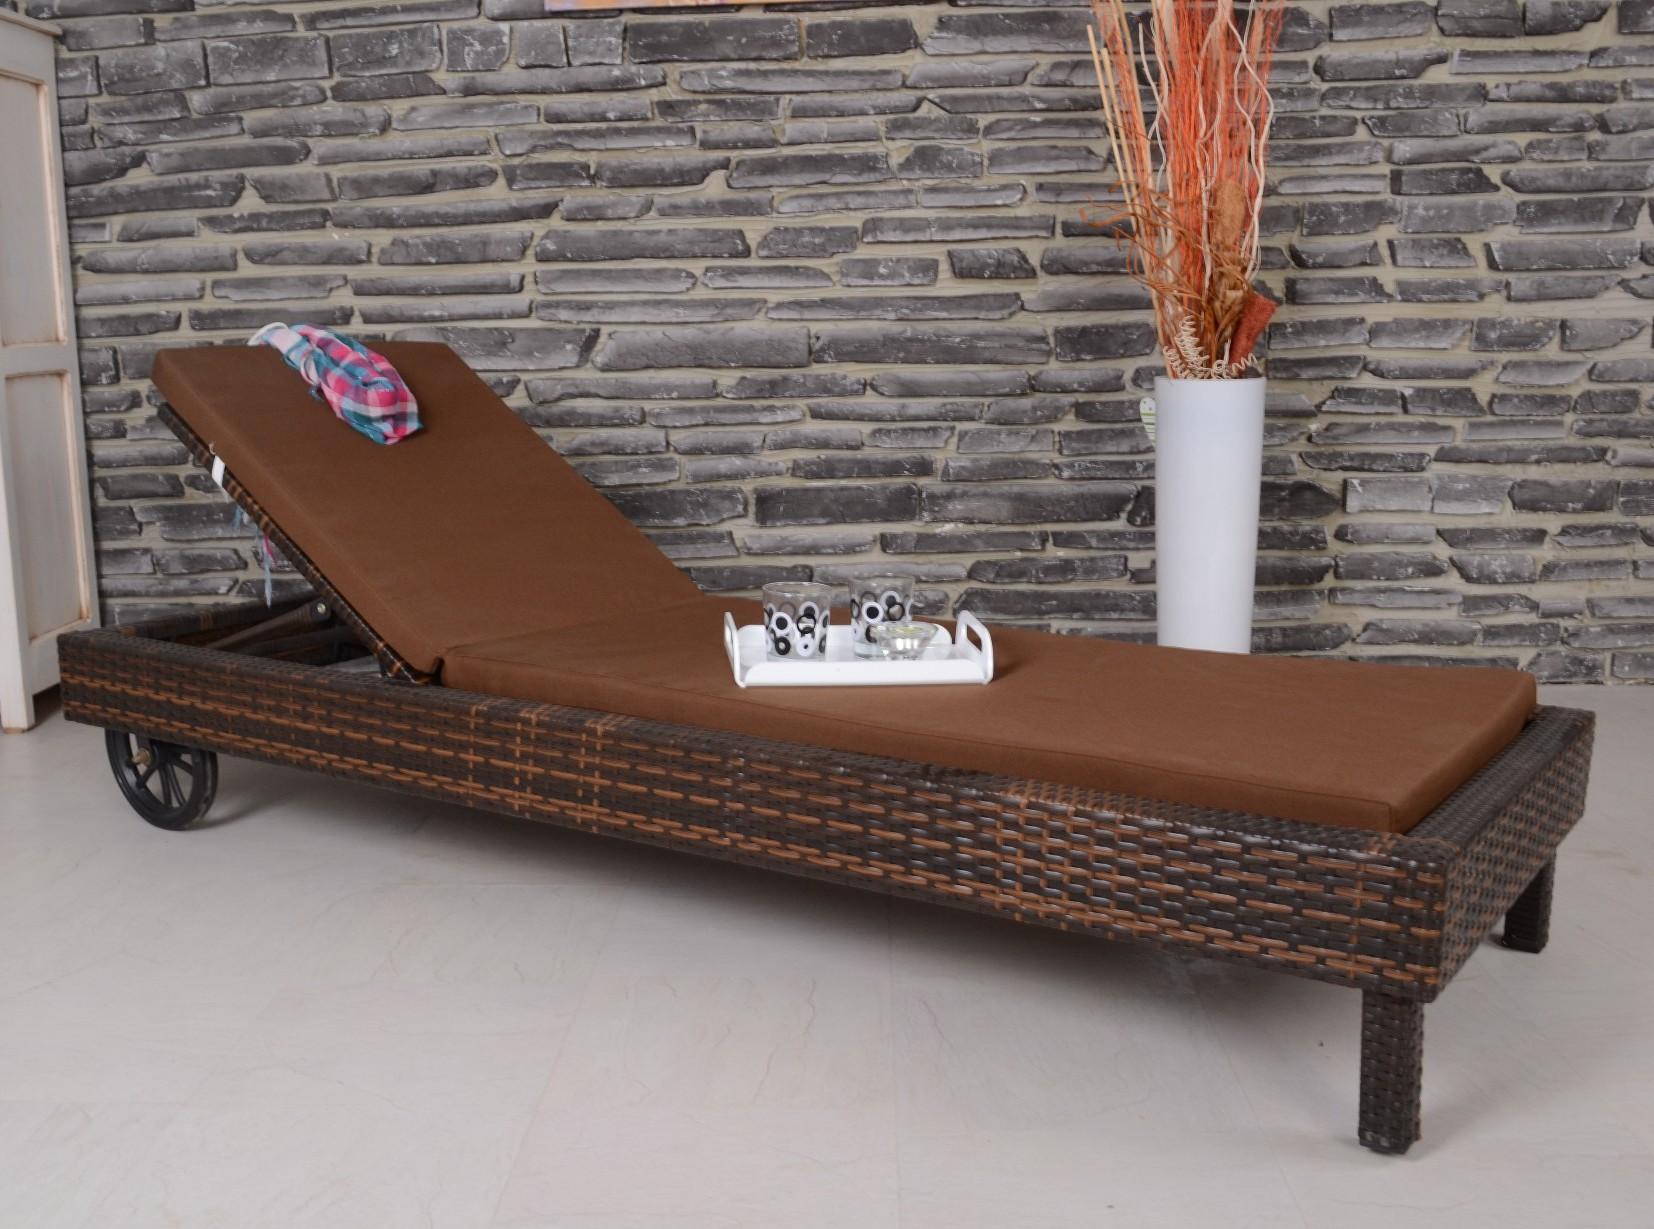 preisvergleich eu gartenliege aus polyrattan. Black Bedroom Furniture Sets. Home Design Ideas